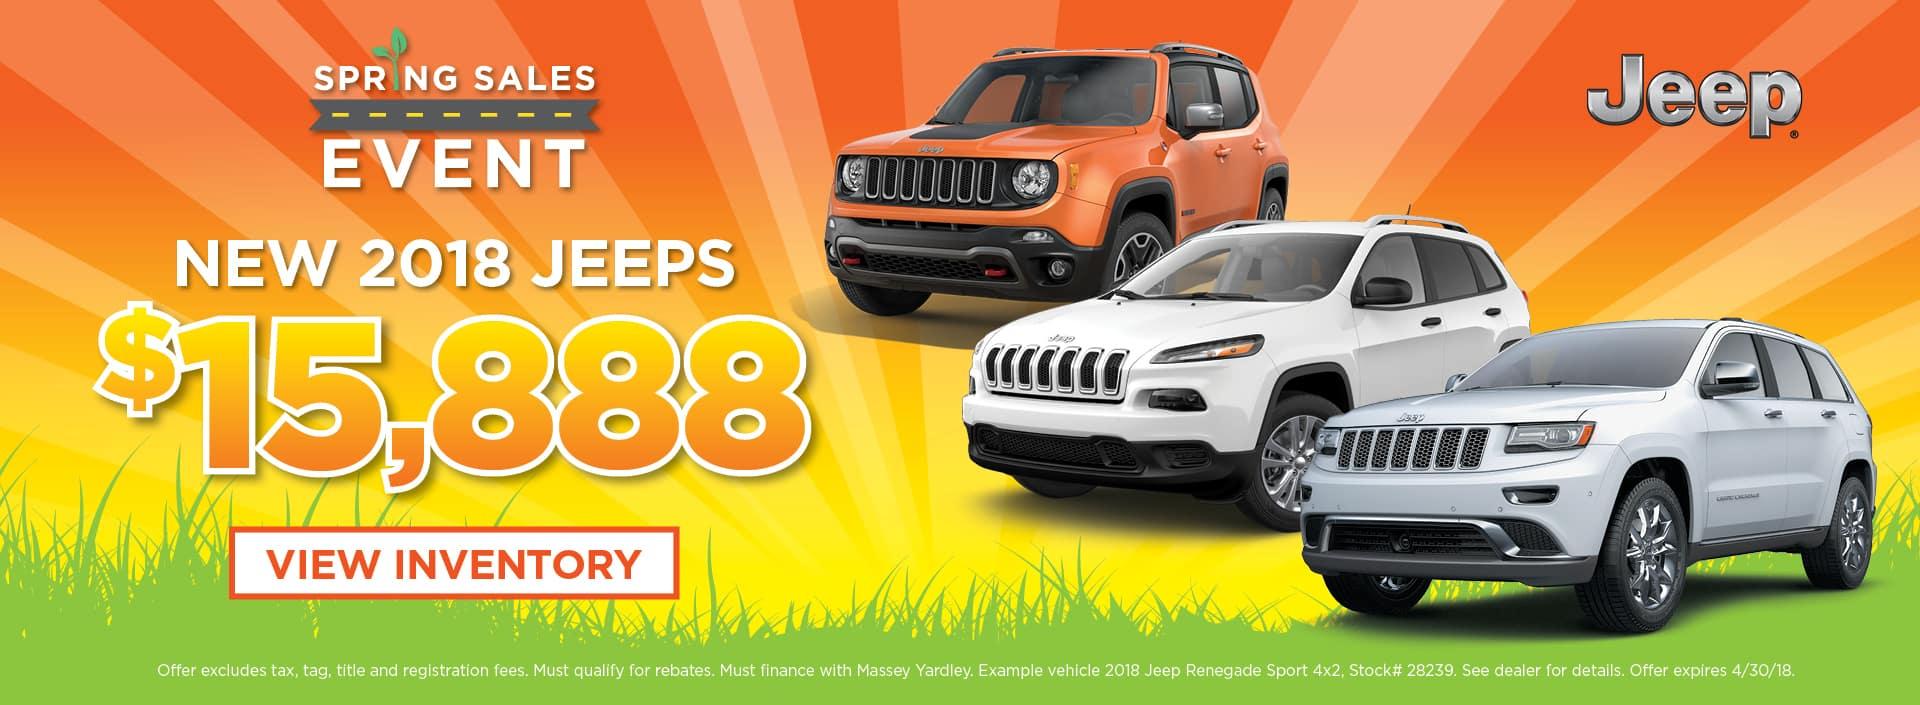 jeep banner